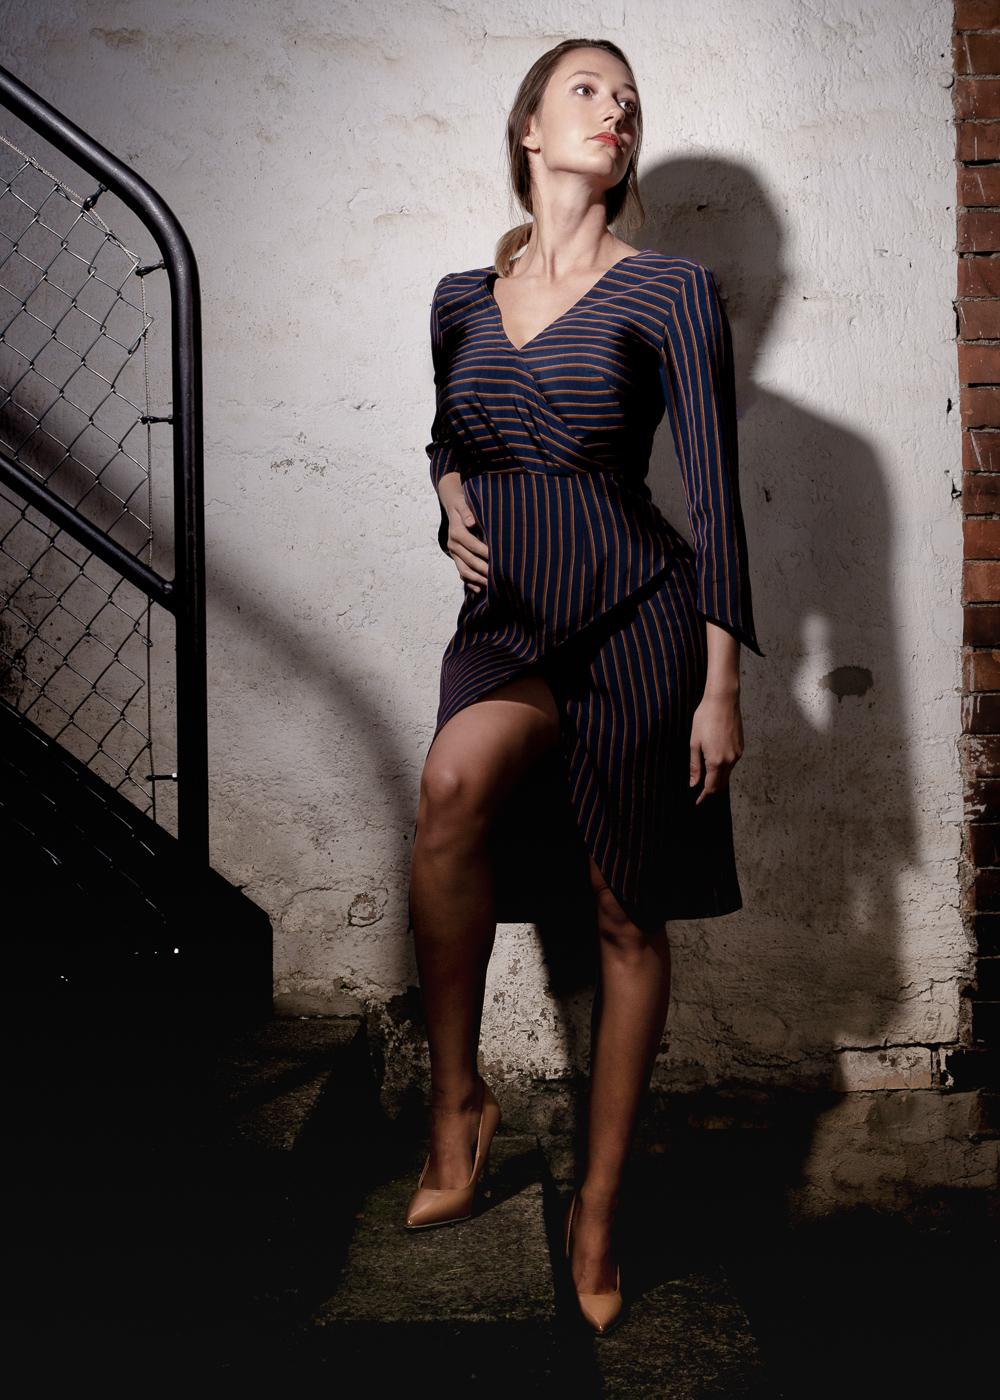 LOOK 4 Silk Plisse Maxi Skirt – Gold Crop Top